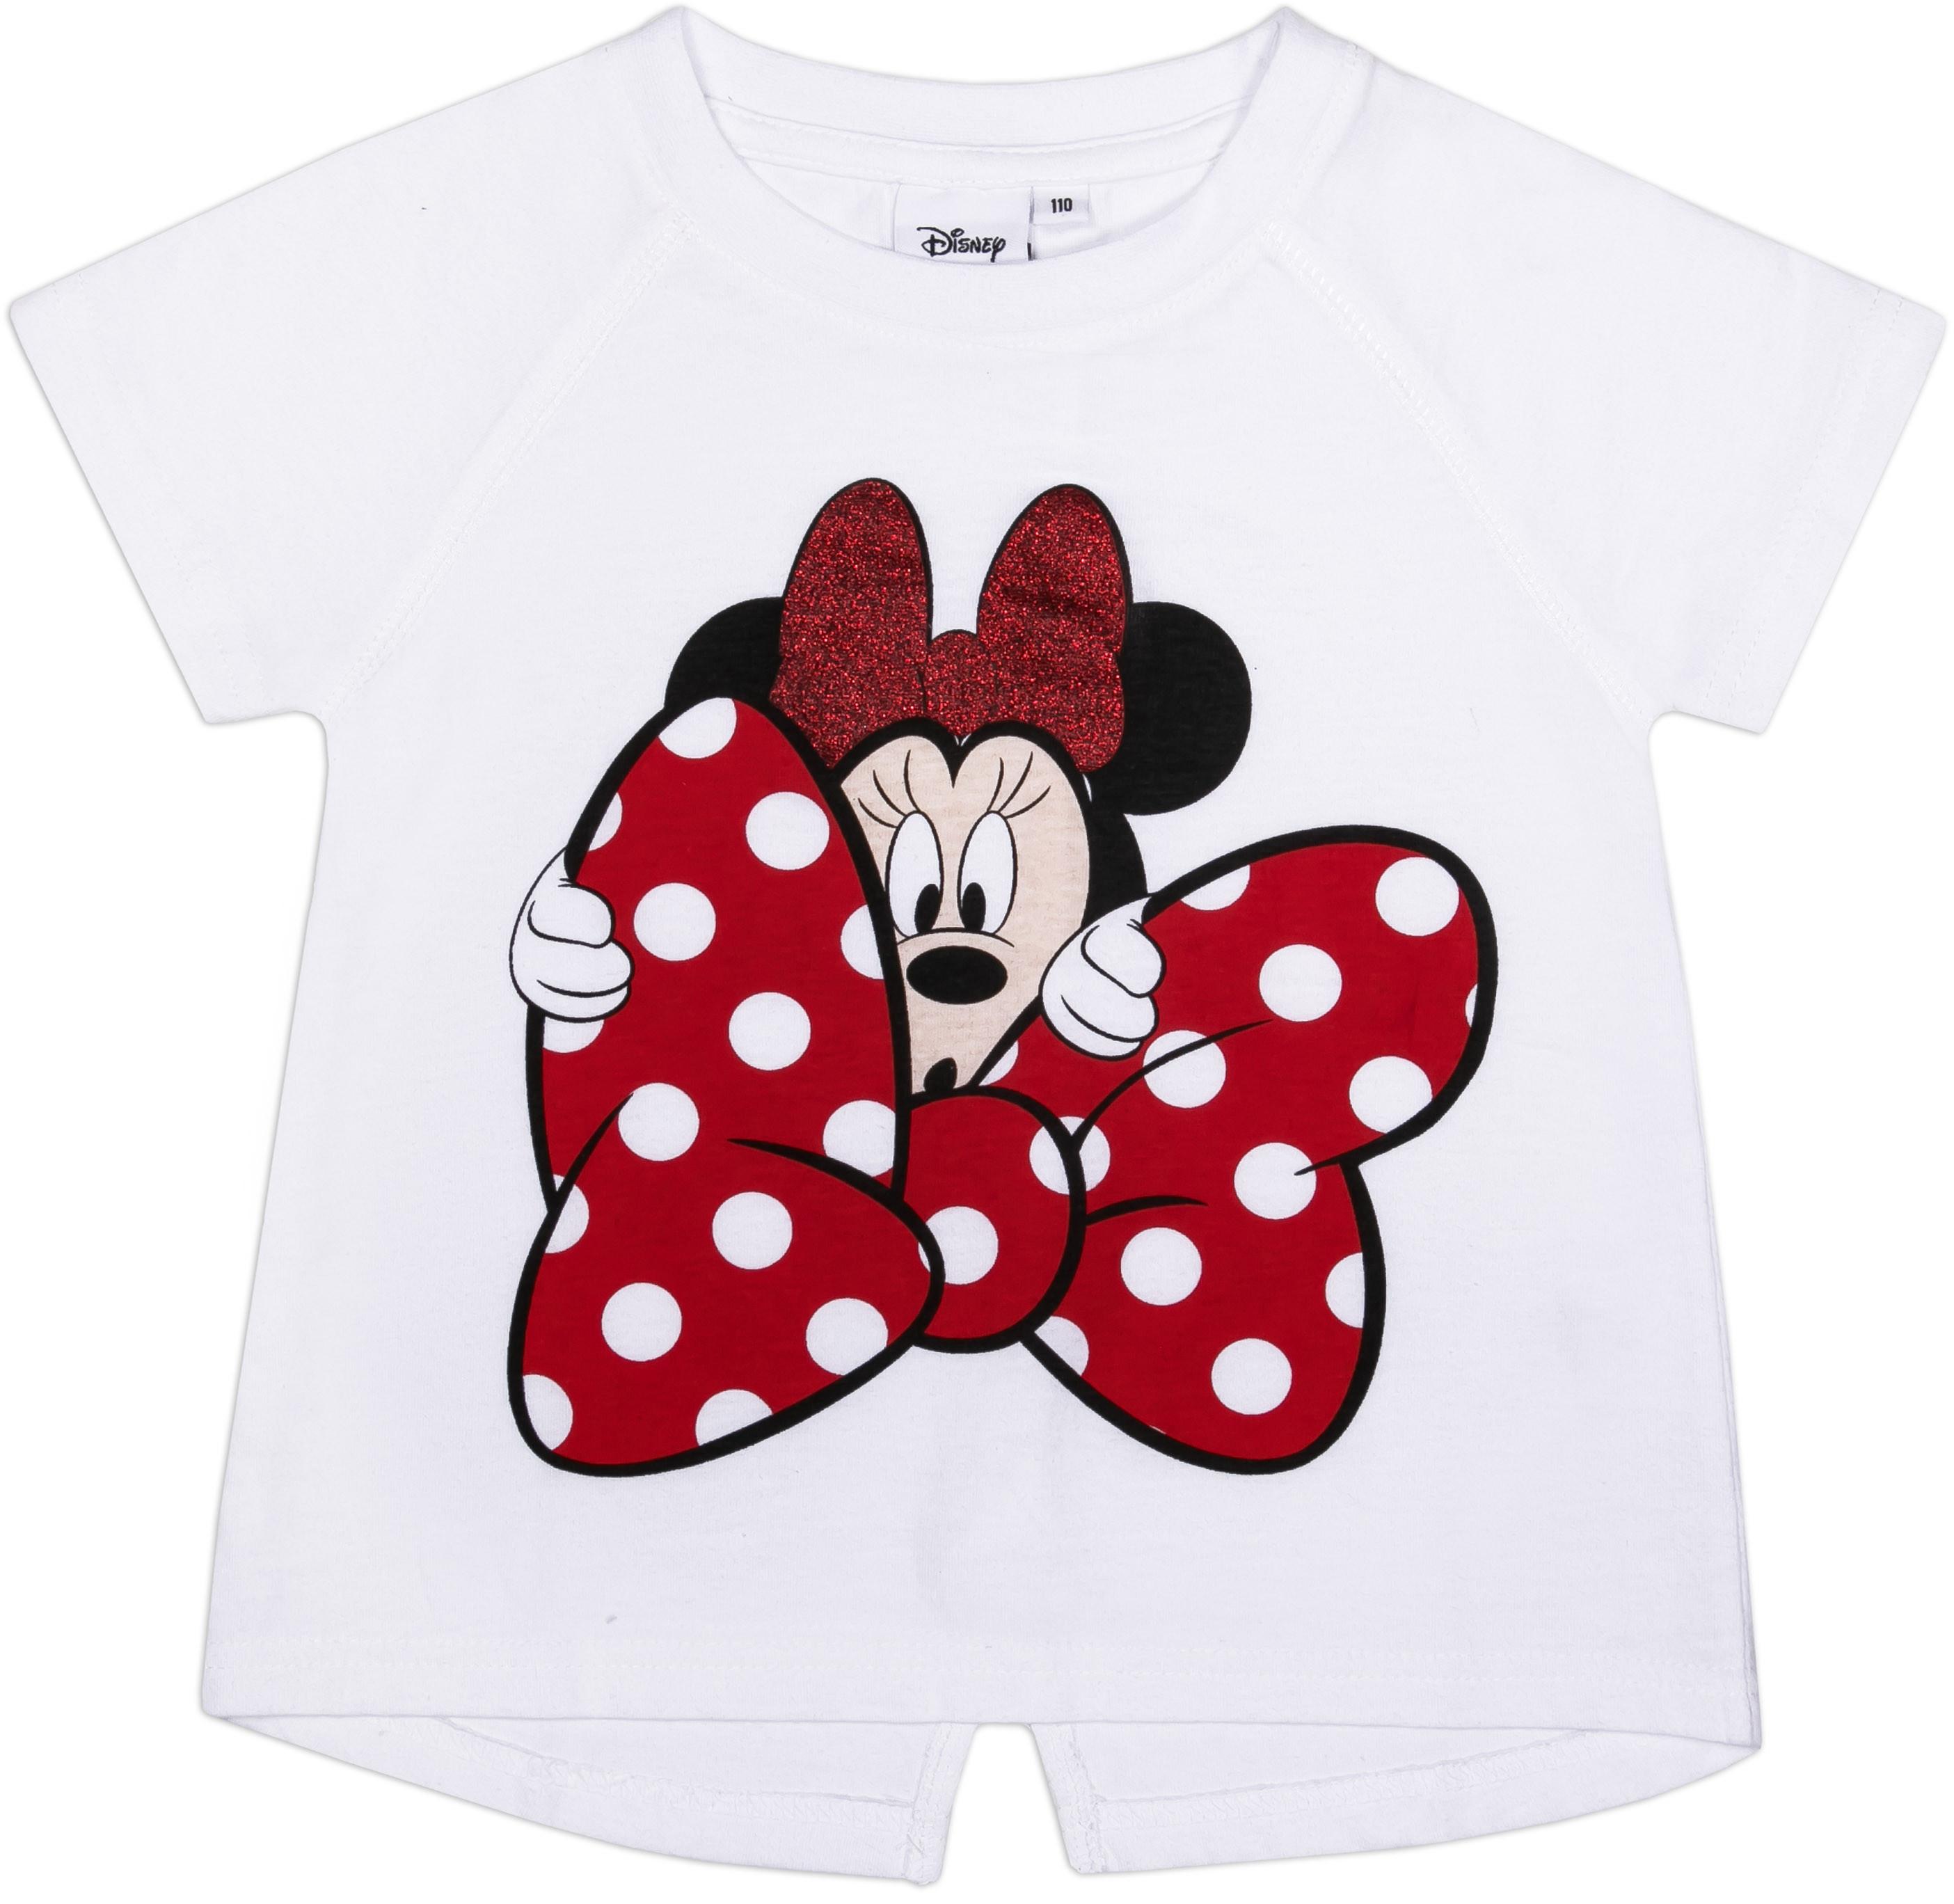 Футболки Barkito Футболка с коротким рукавом для девочки Minnie, белая patrizia pepe хлопковая футболка с коротким рукавом